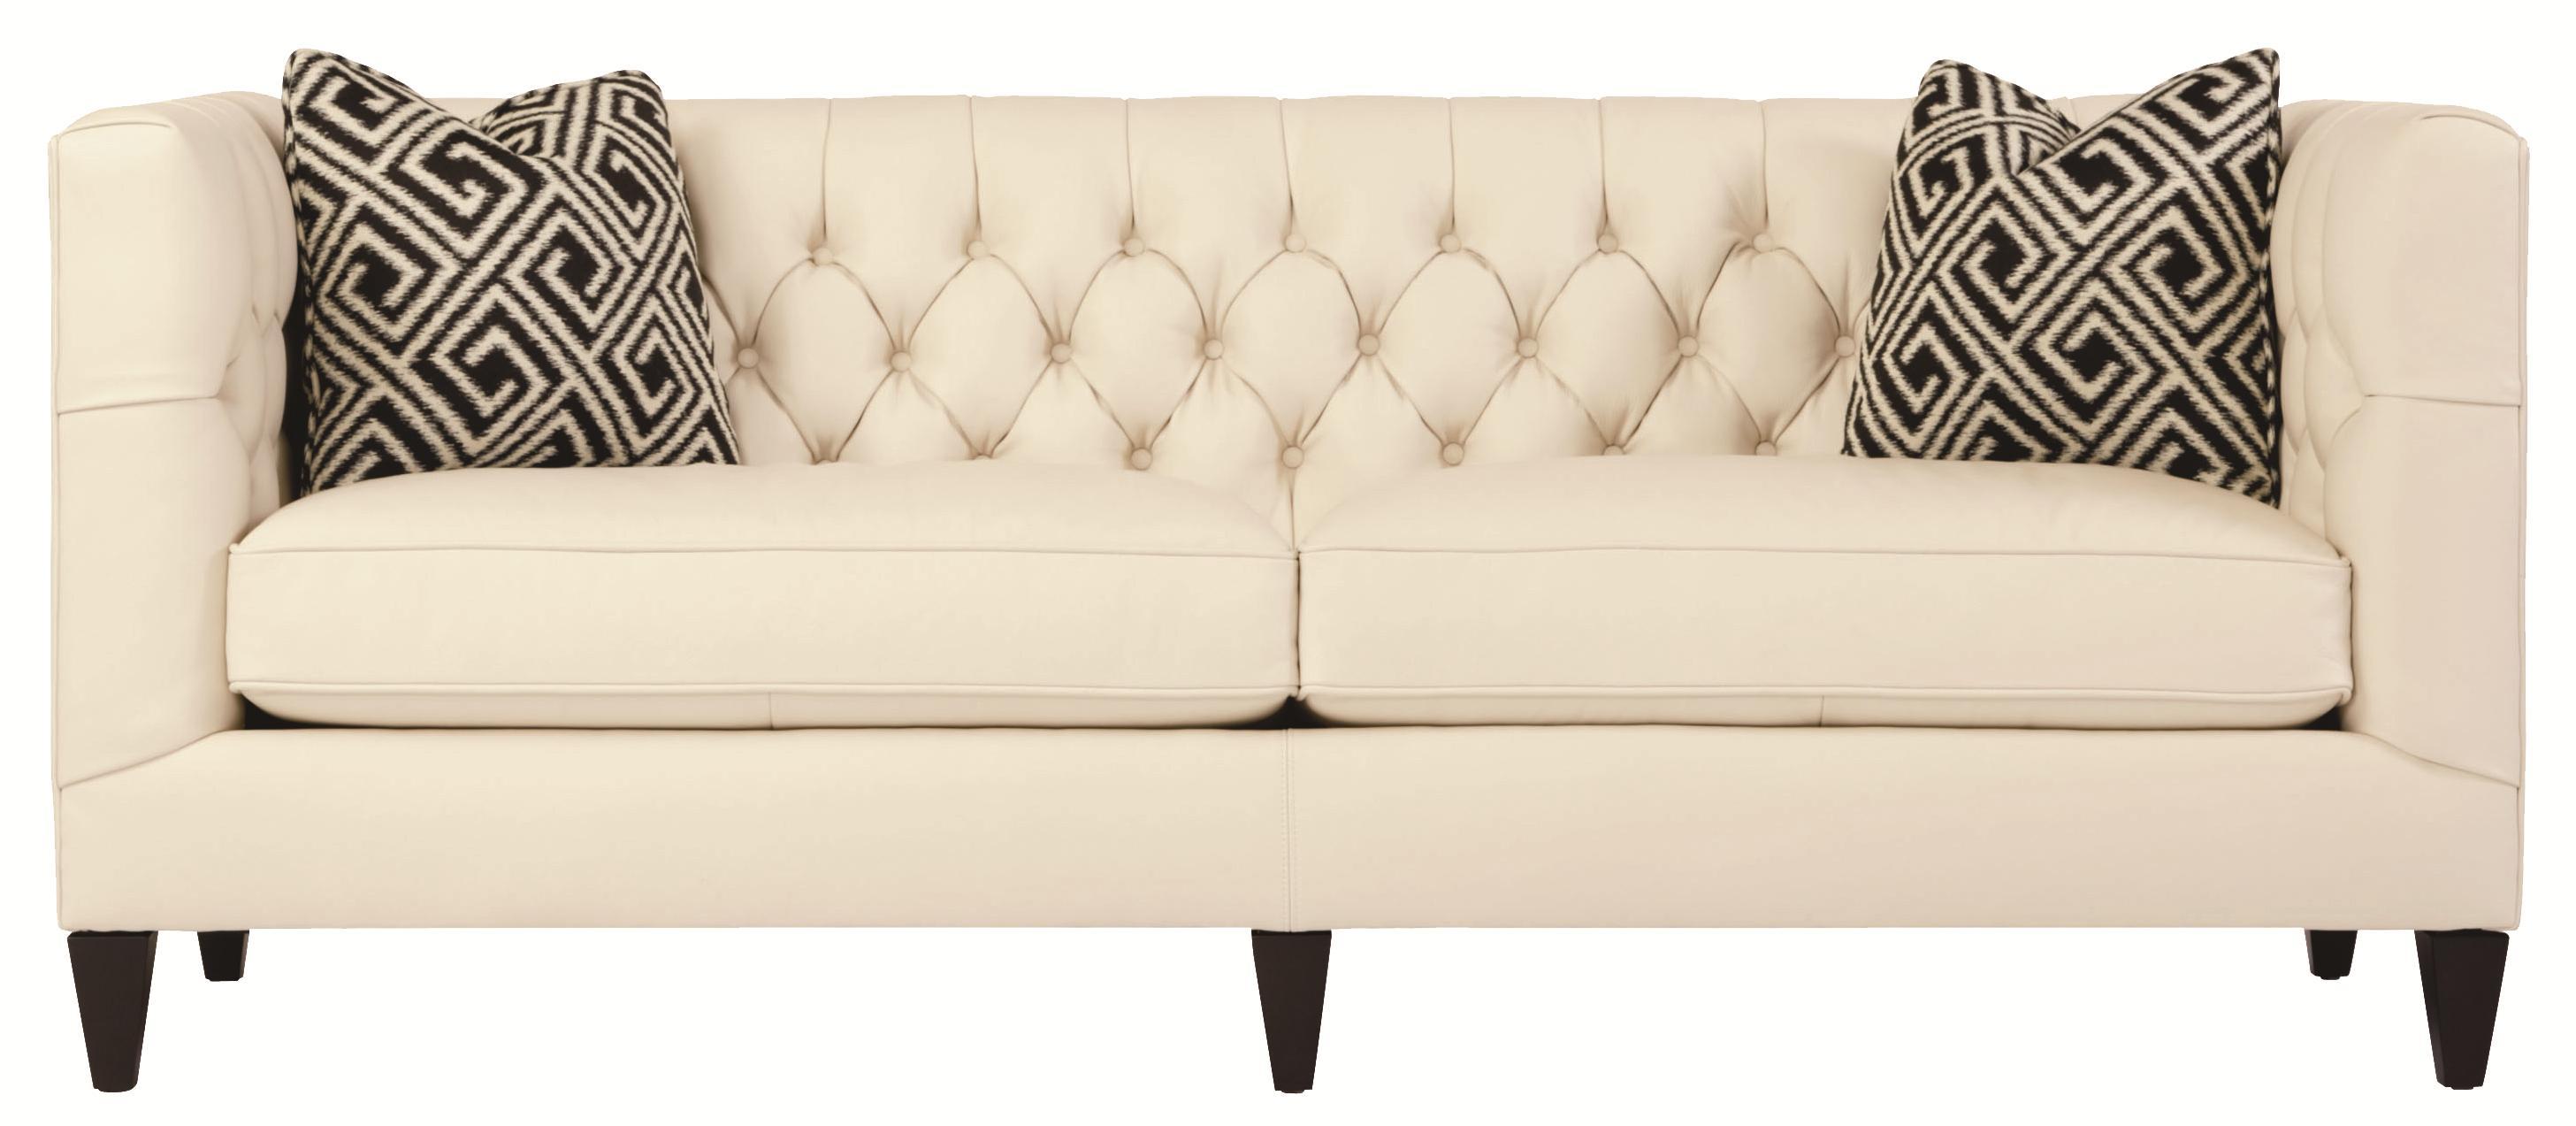 Genial Bernhardt Interiors   Sofas Transitional Styled Beckett Leather Sofa In Tuxedo  Sofa Style